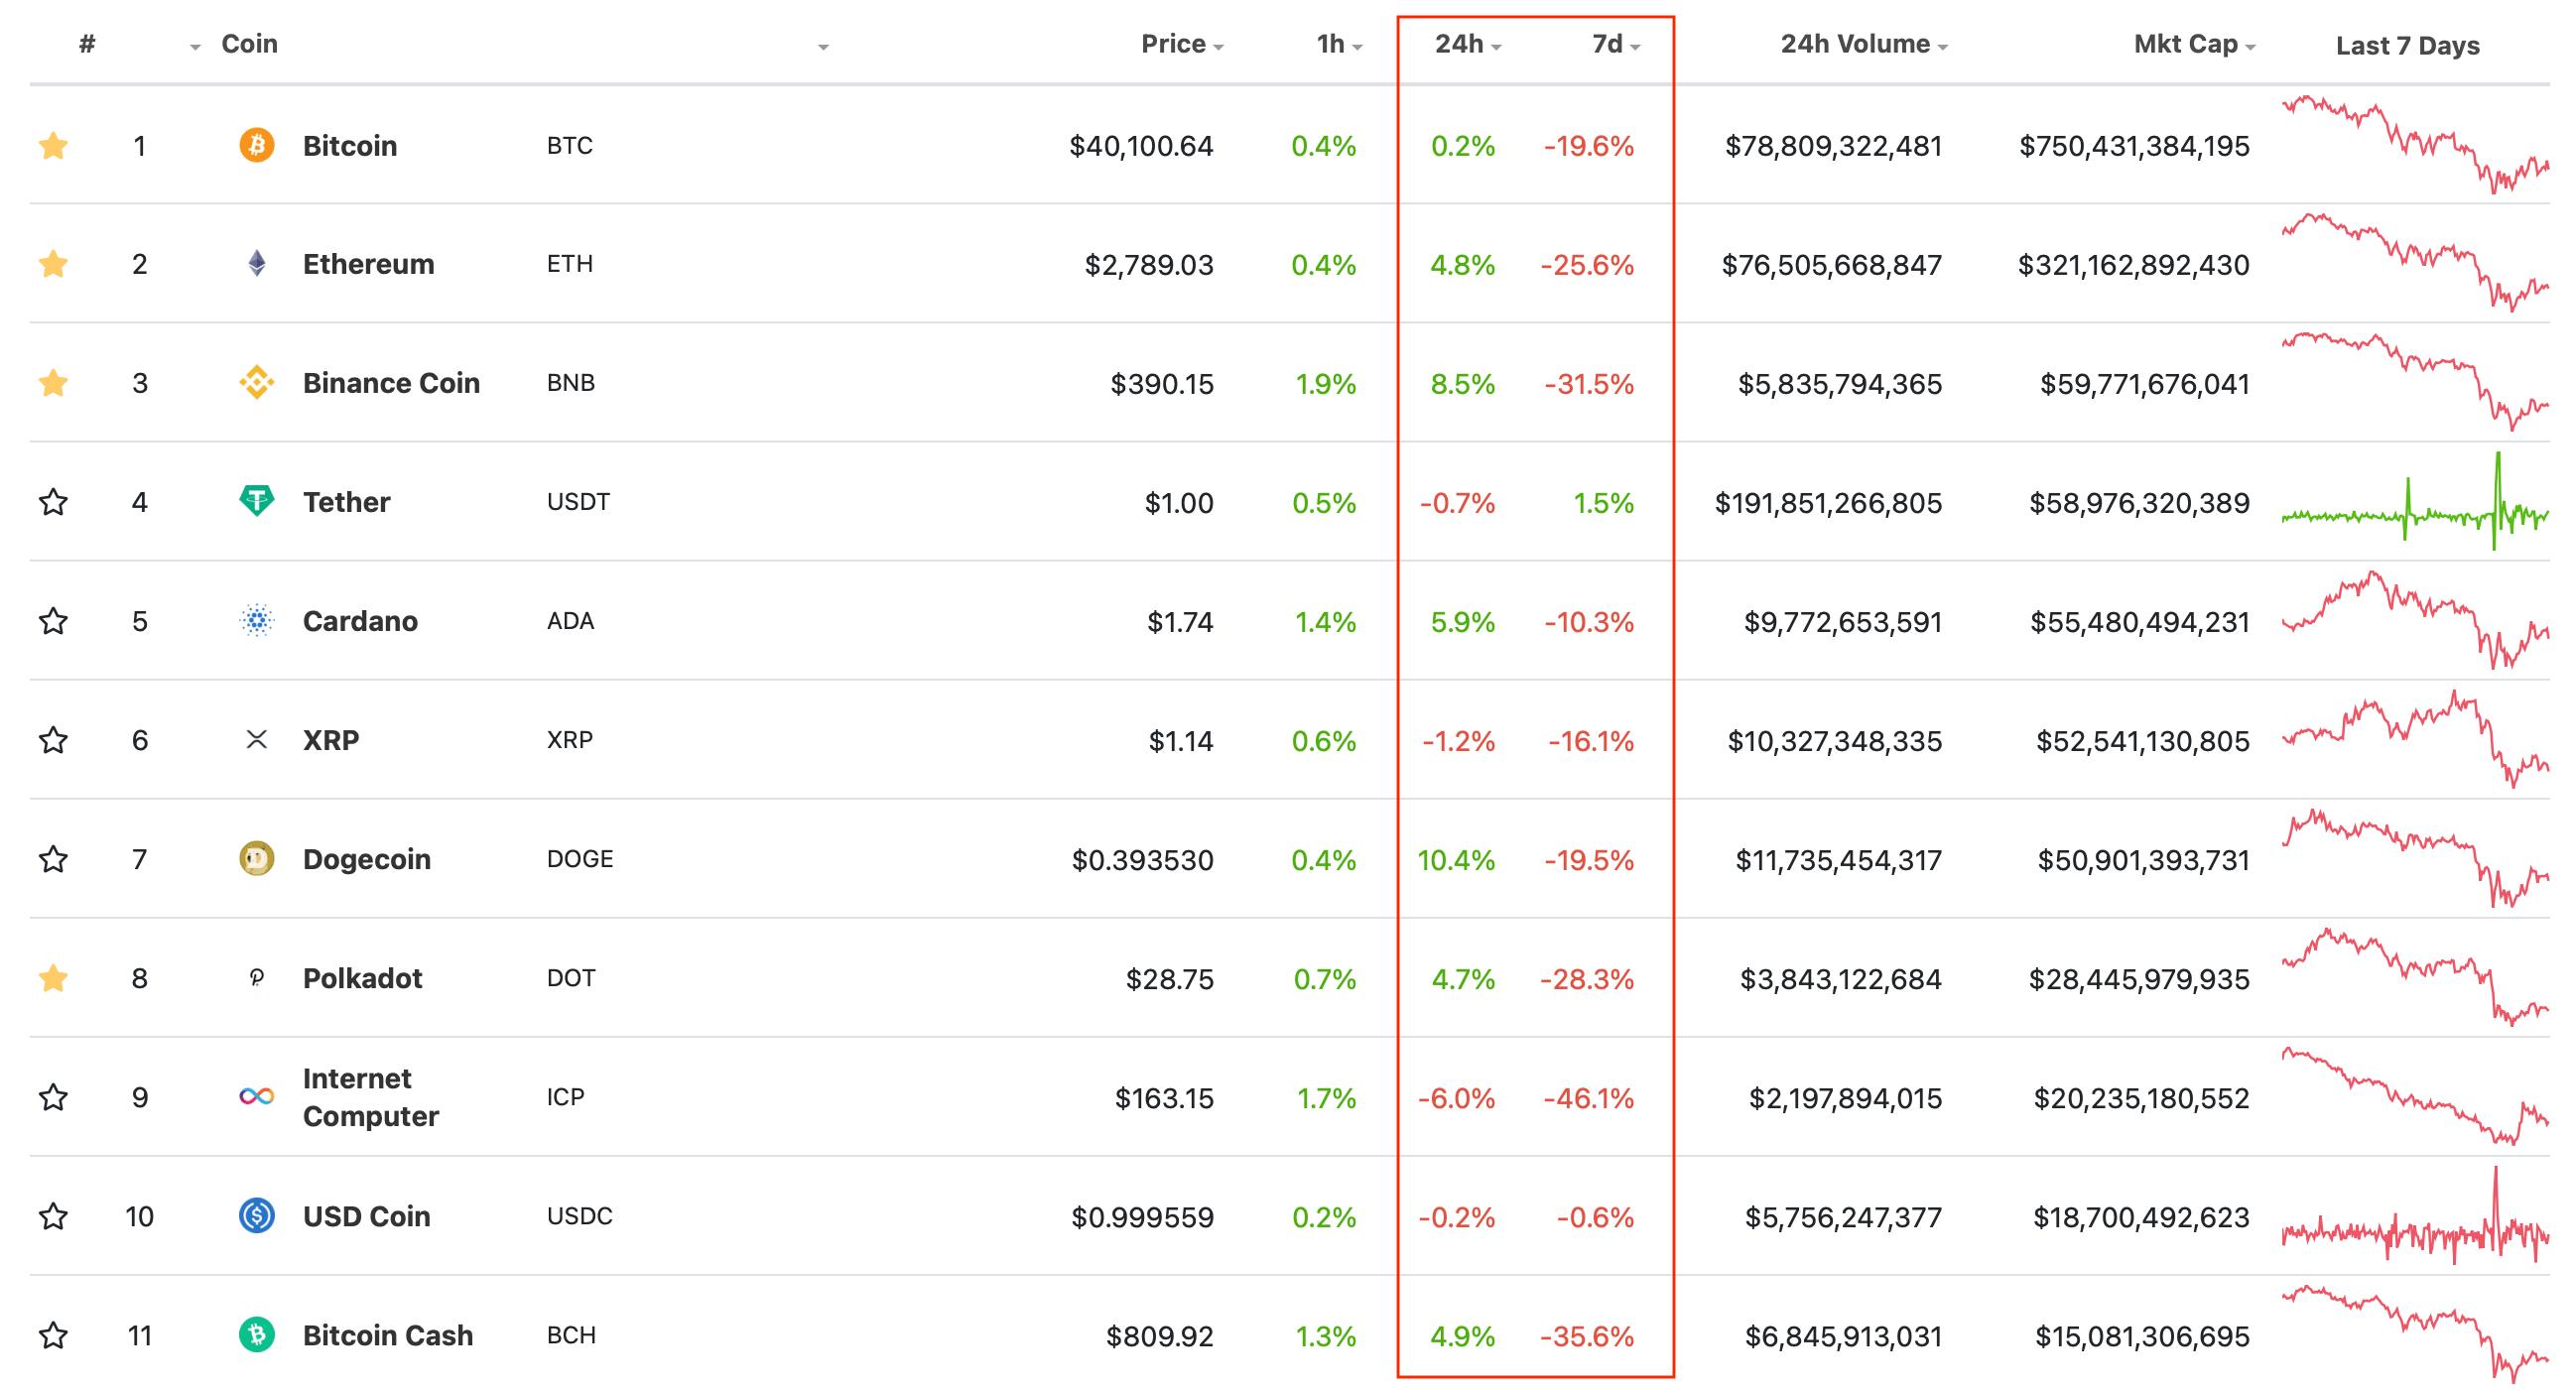 топ криптовалюты блокчейн